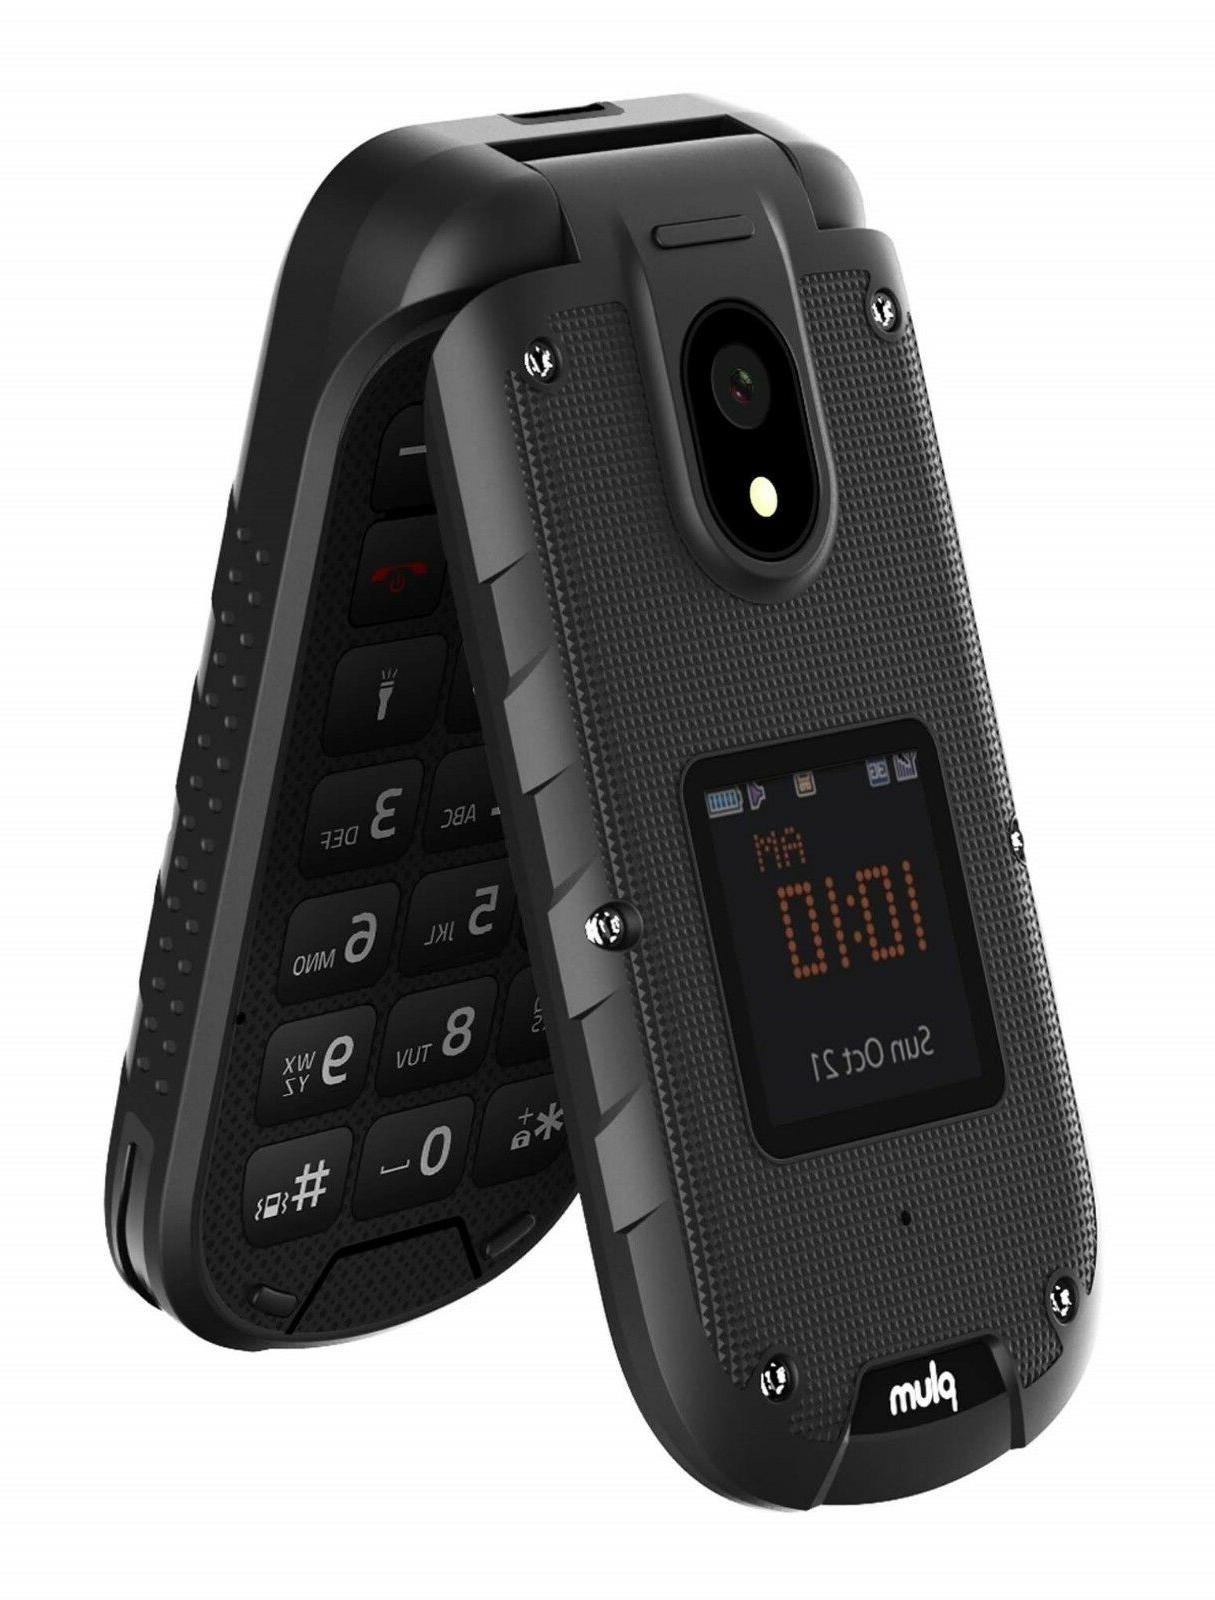 rugged flip phone 3g gsm water shock